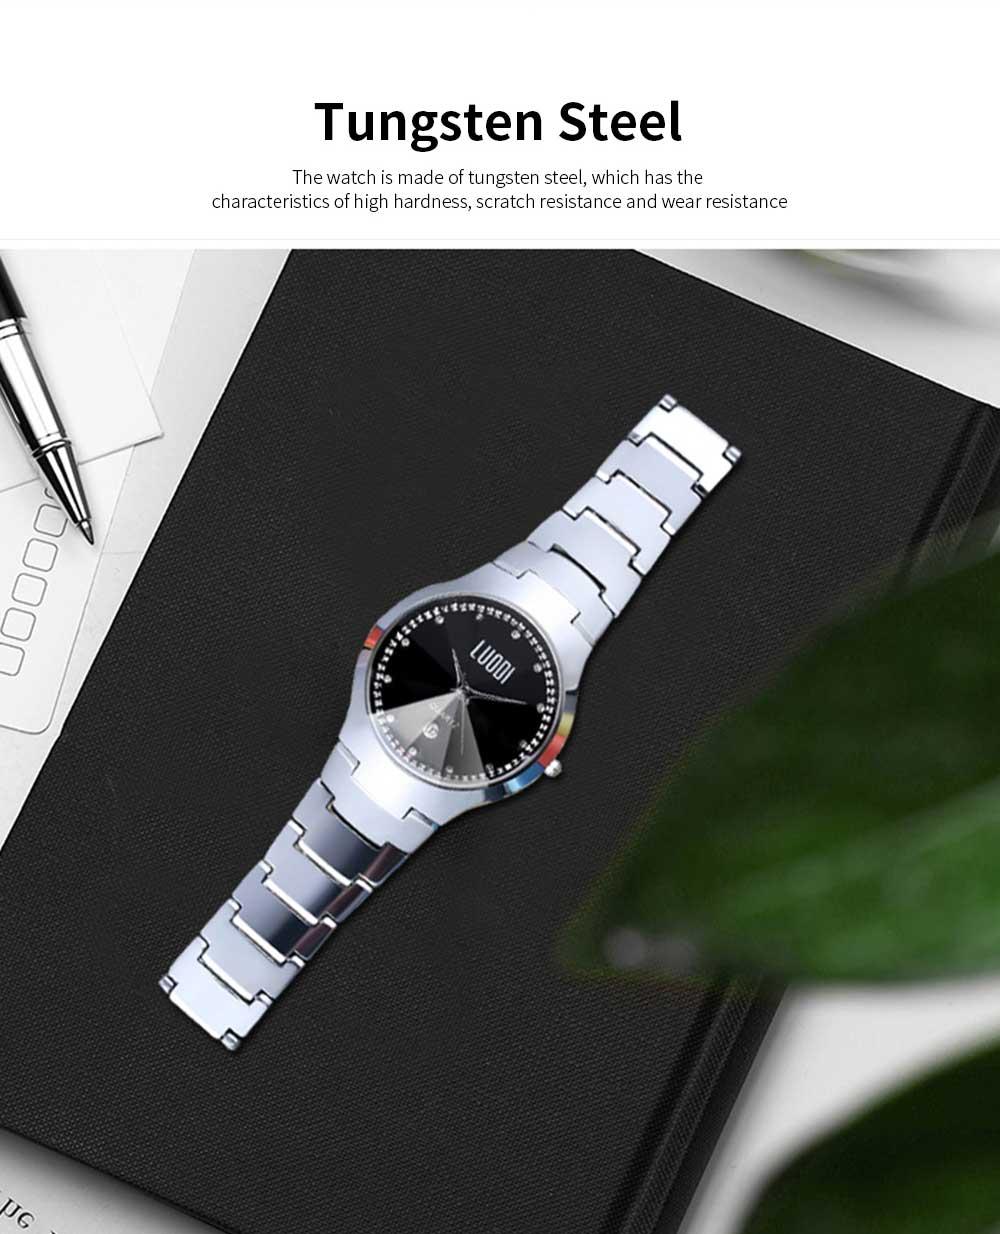 Tungsten Steel Watch for Men Fashion Cool Black Quartz Movement Waterproof 3D Watch Case WristWatch Stylish Couple Watches 1